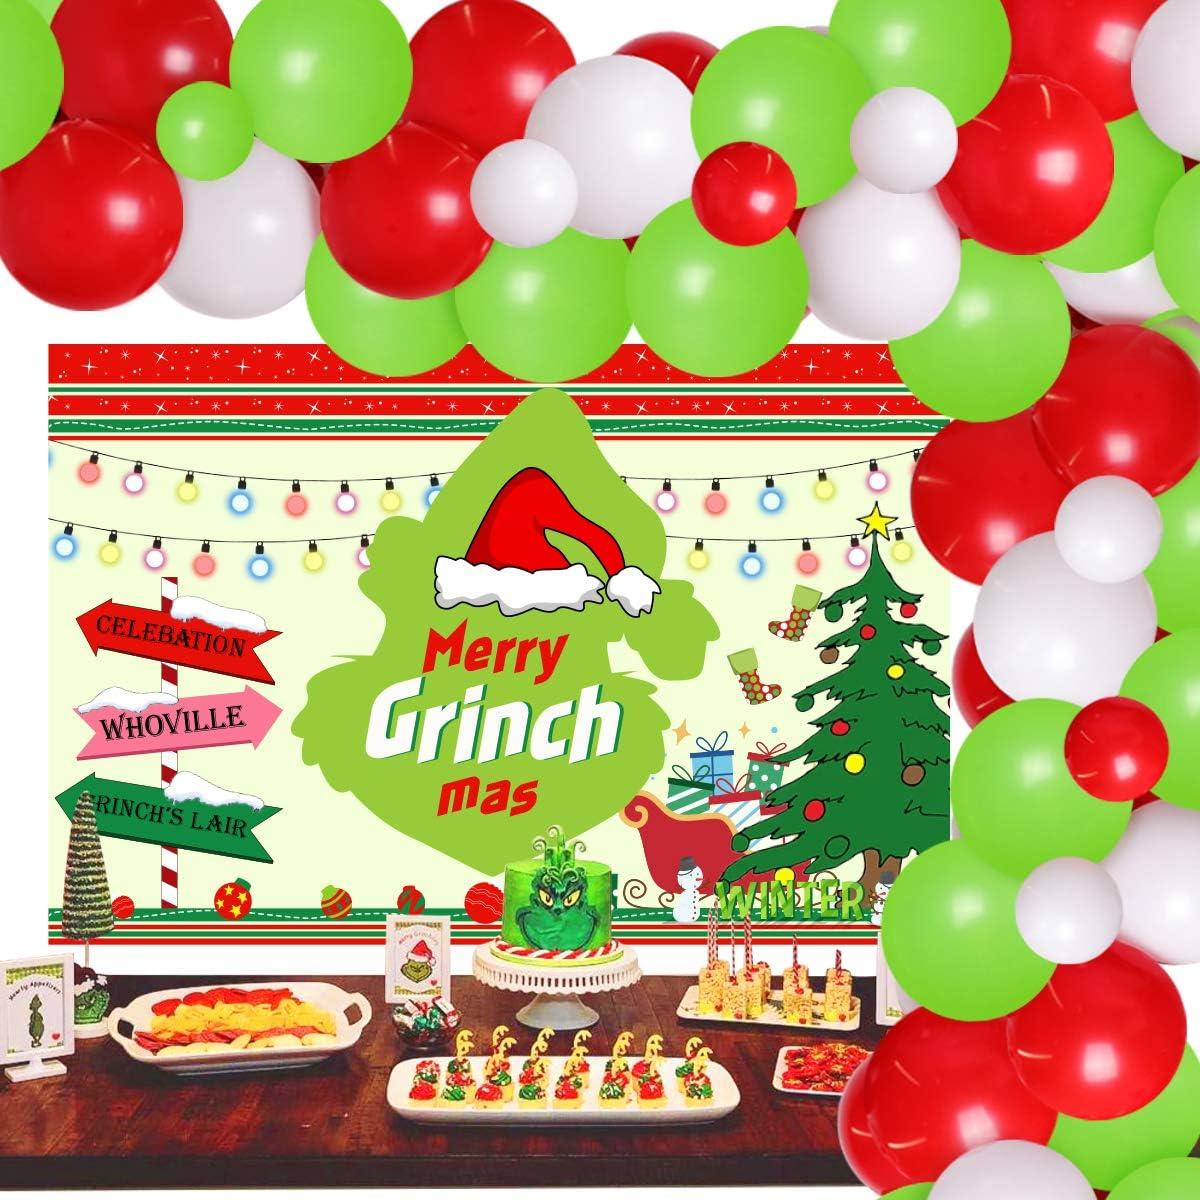 Jollyboom Merry Grinchmas Backdrop Balloon Garland Arch Kit Grinch Theme Christmas Decorations for Merry Christmas Xmas Party Supplies Merry Grinchmas Decor